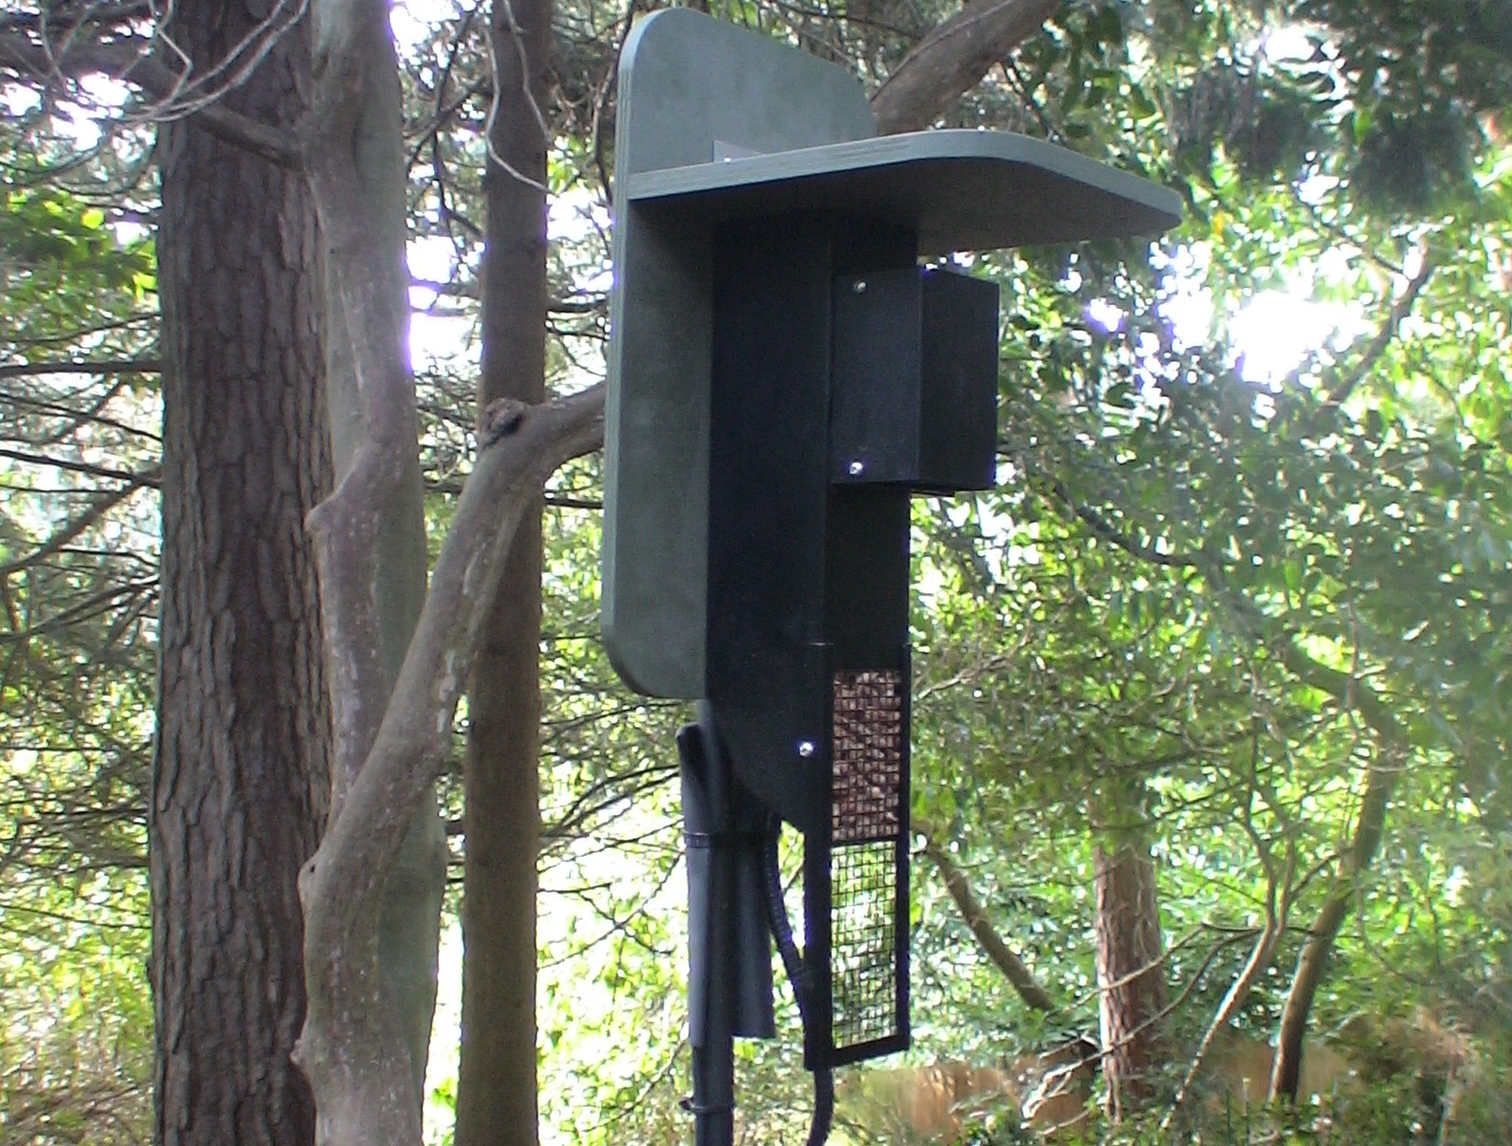 WW peanut feeder camera